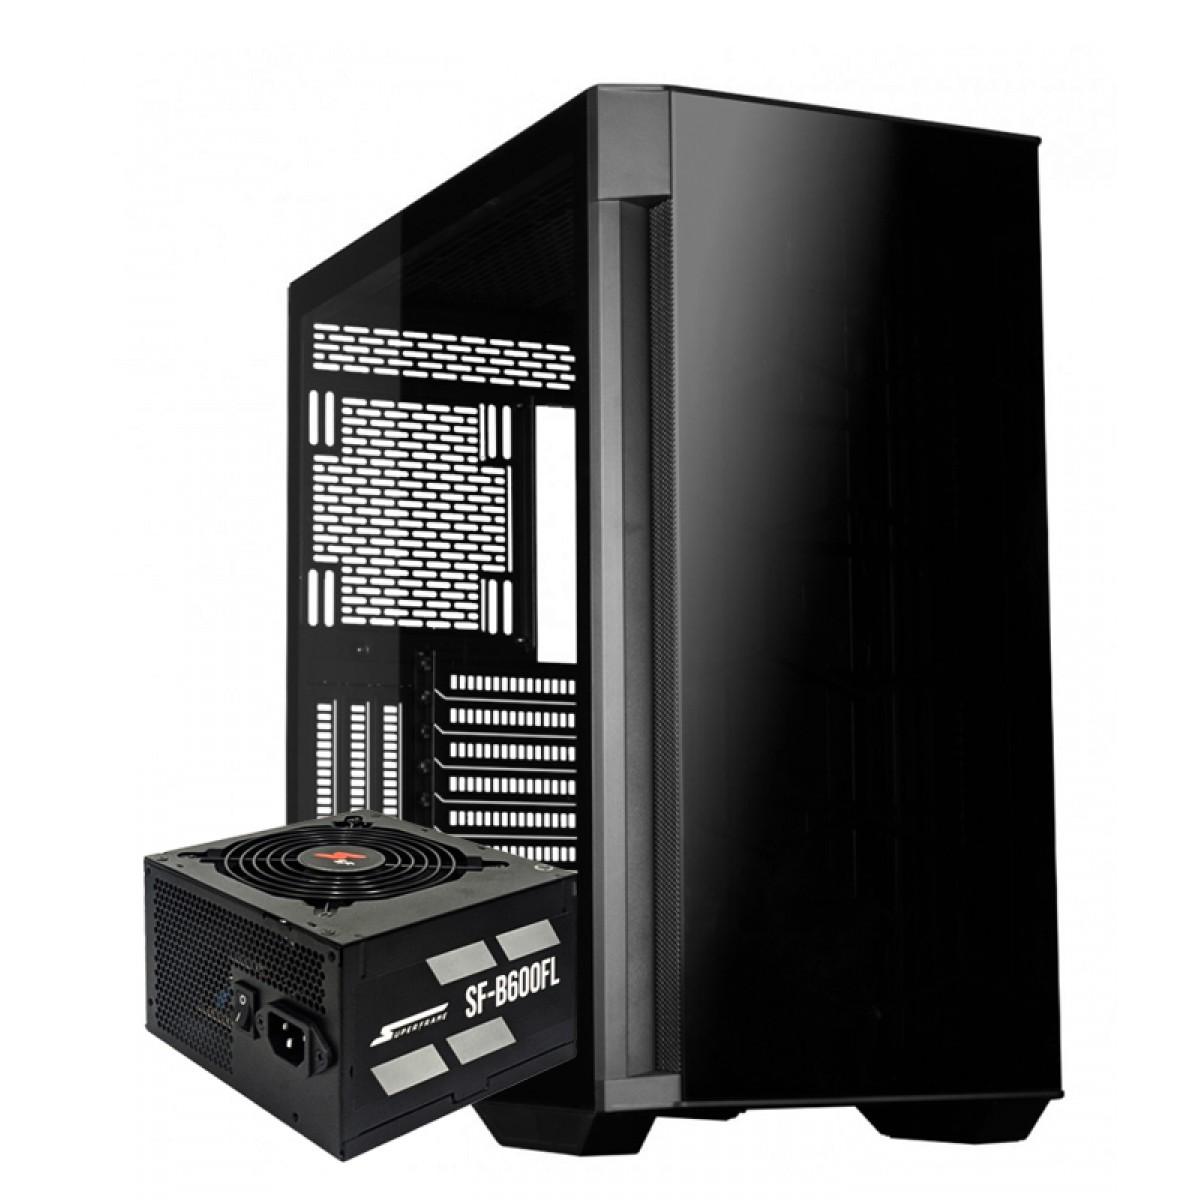 Kit Upgrade, Gabinete Redragon Megatron, Fonte SuperFrame 600W